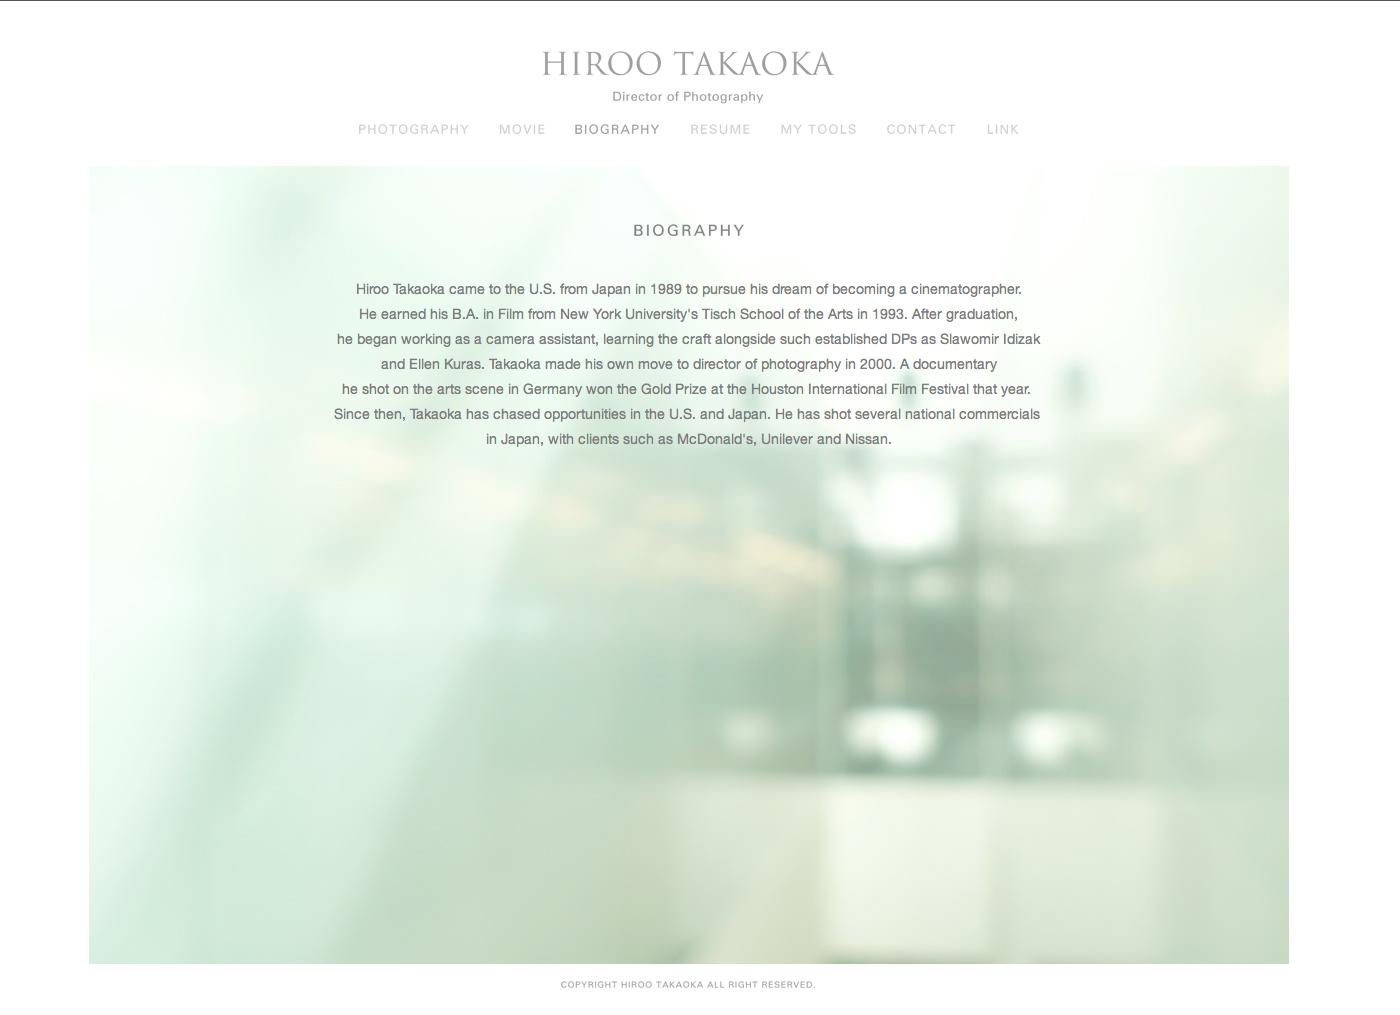 and_Design_HirooTakaoka_web_04.jpg